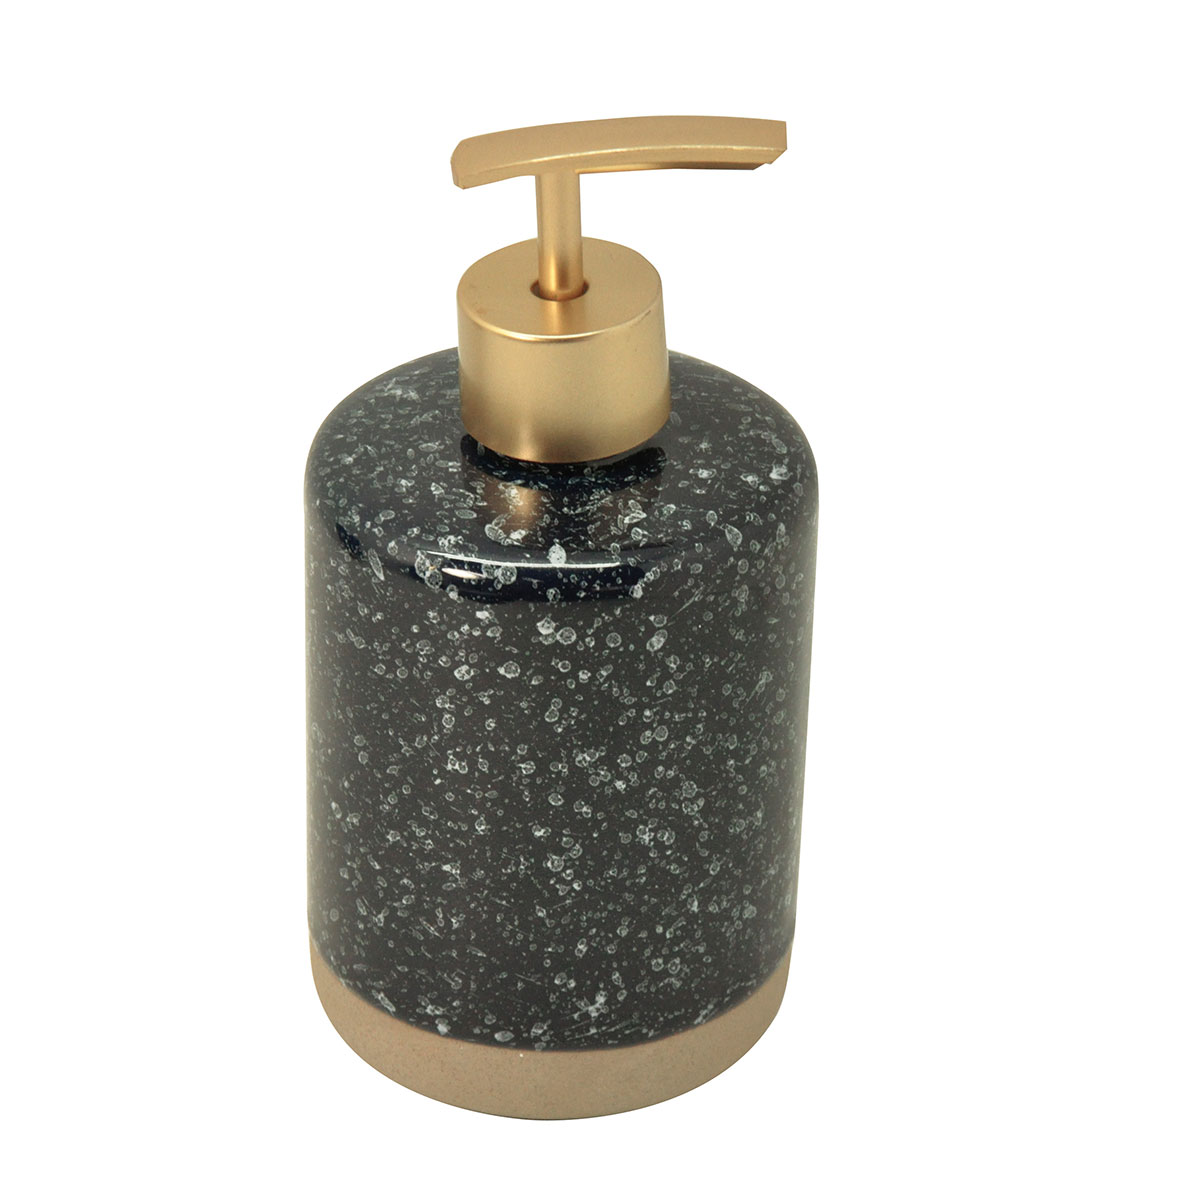 Distributeur de savon effet granite bleu